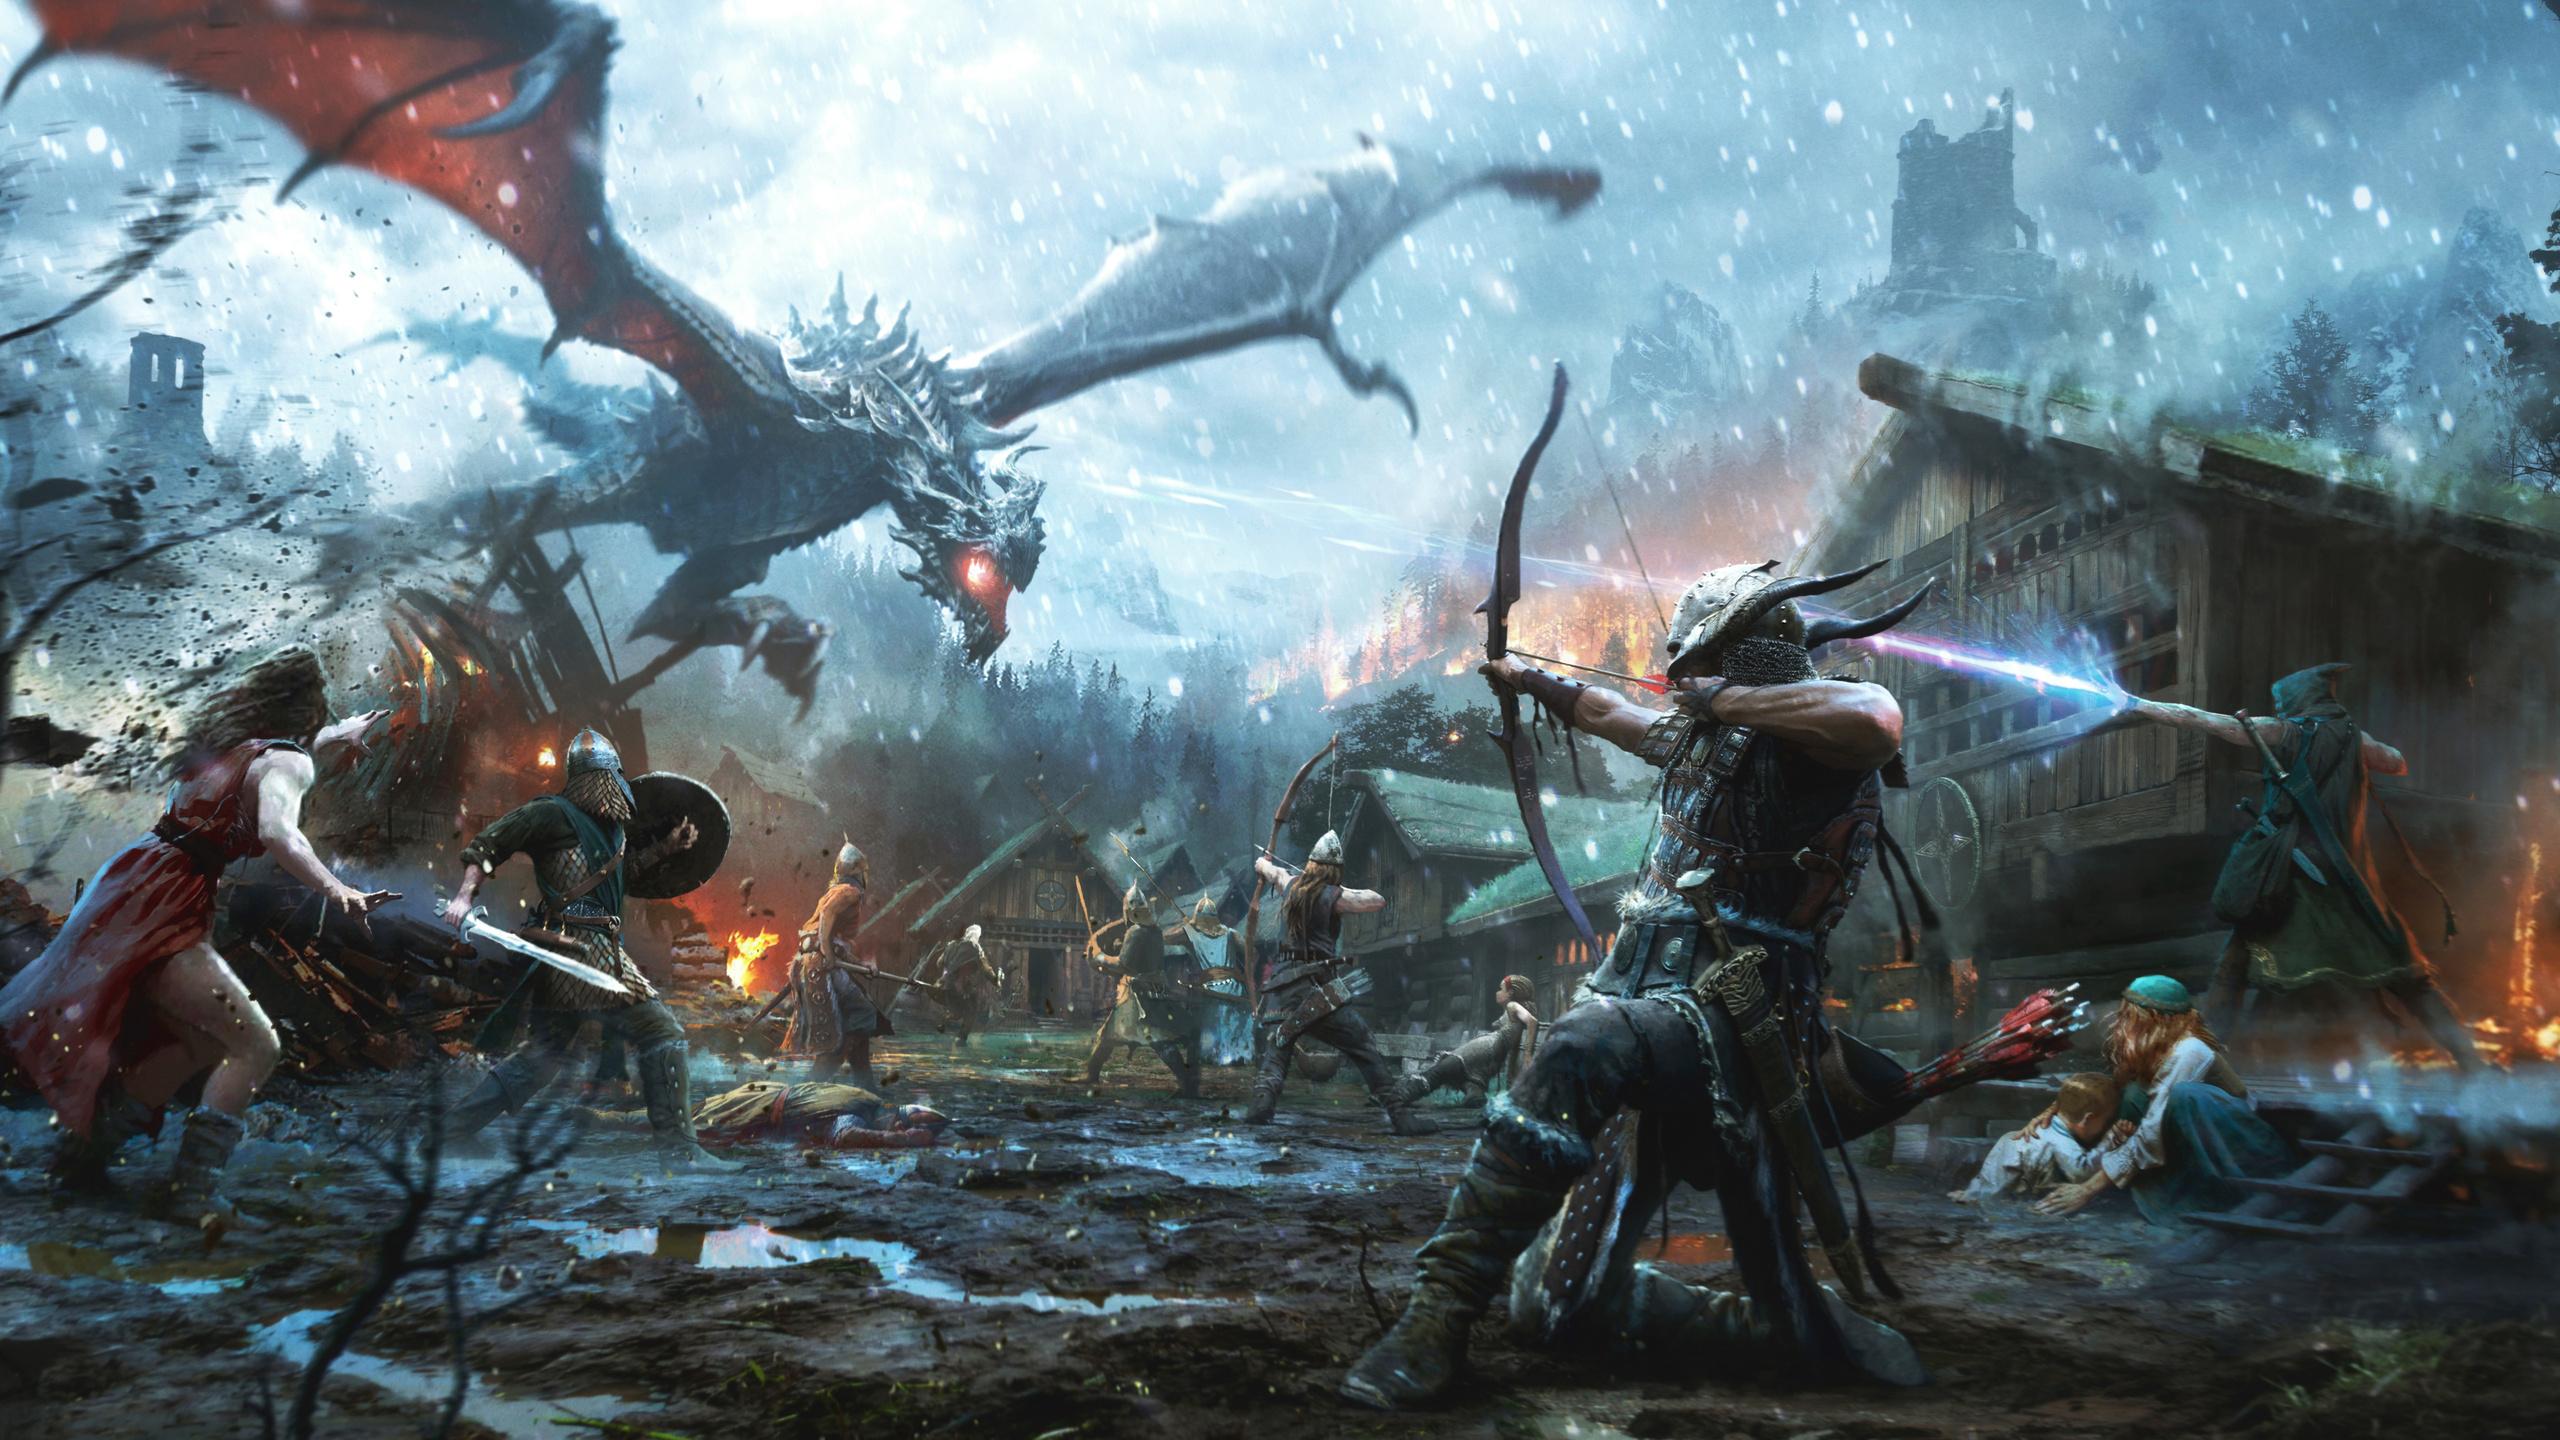 2560x1440 The Elder Scrolls Video Game 4k 1440p Resolution